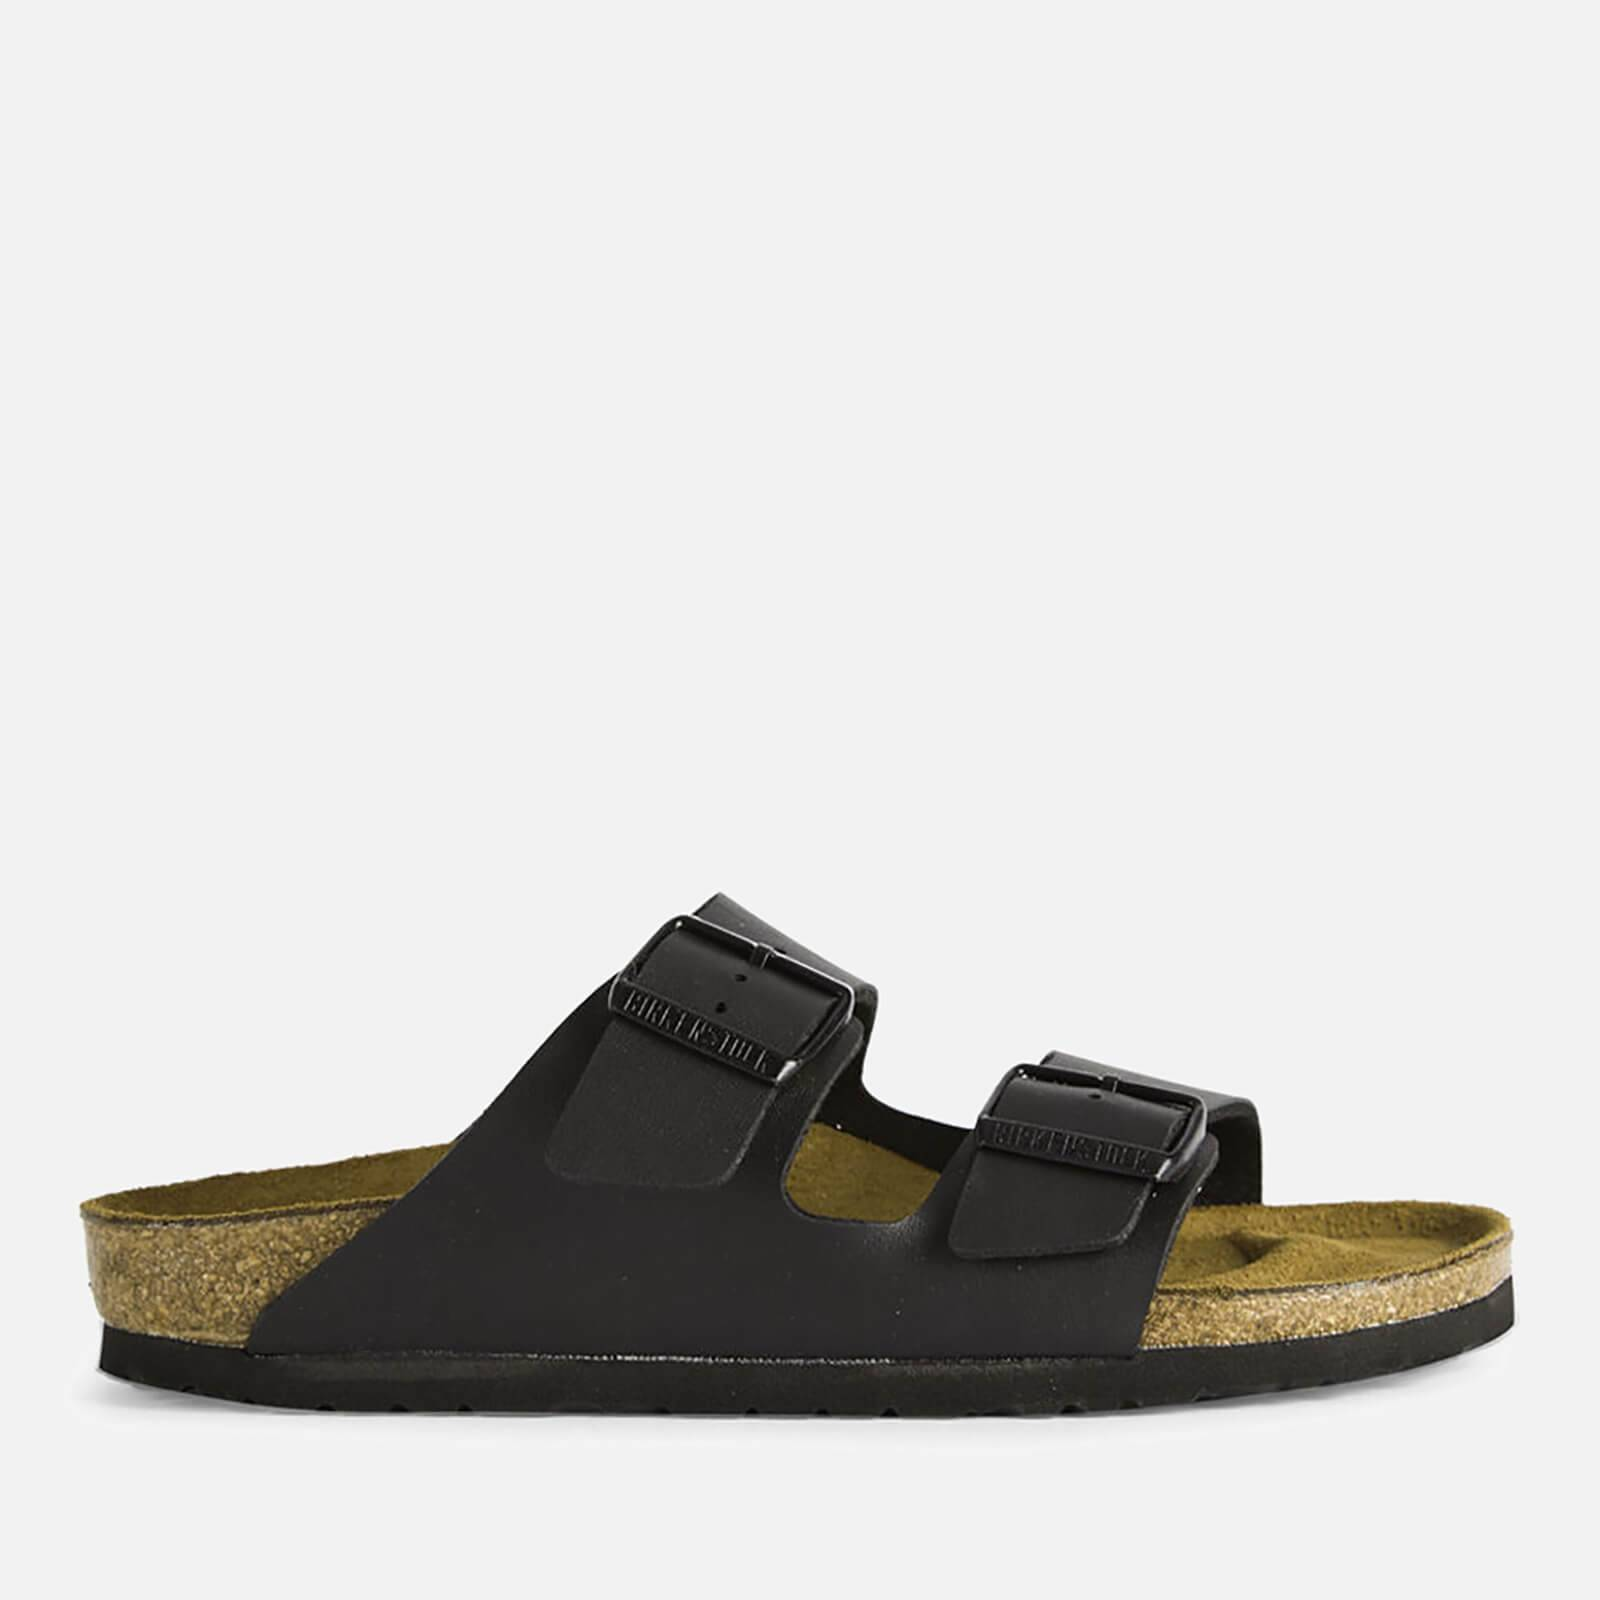 Birkenstock Women's Arizona Slim Fit Double Strap Sandals - Black - EU 39/UK 5.5